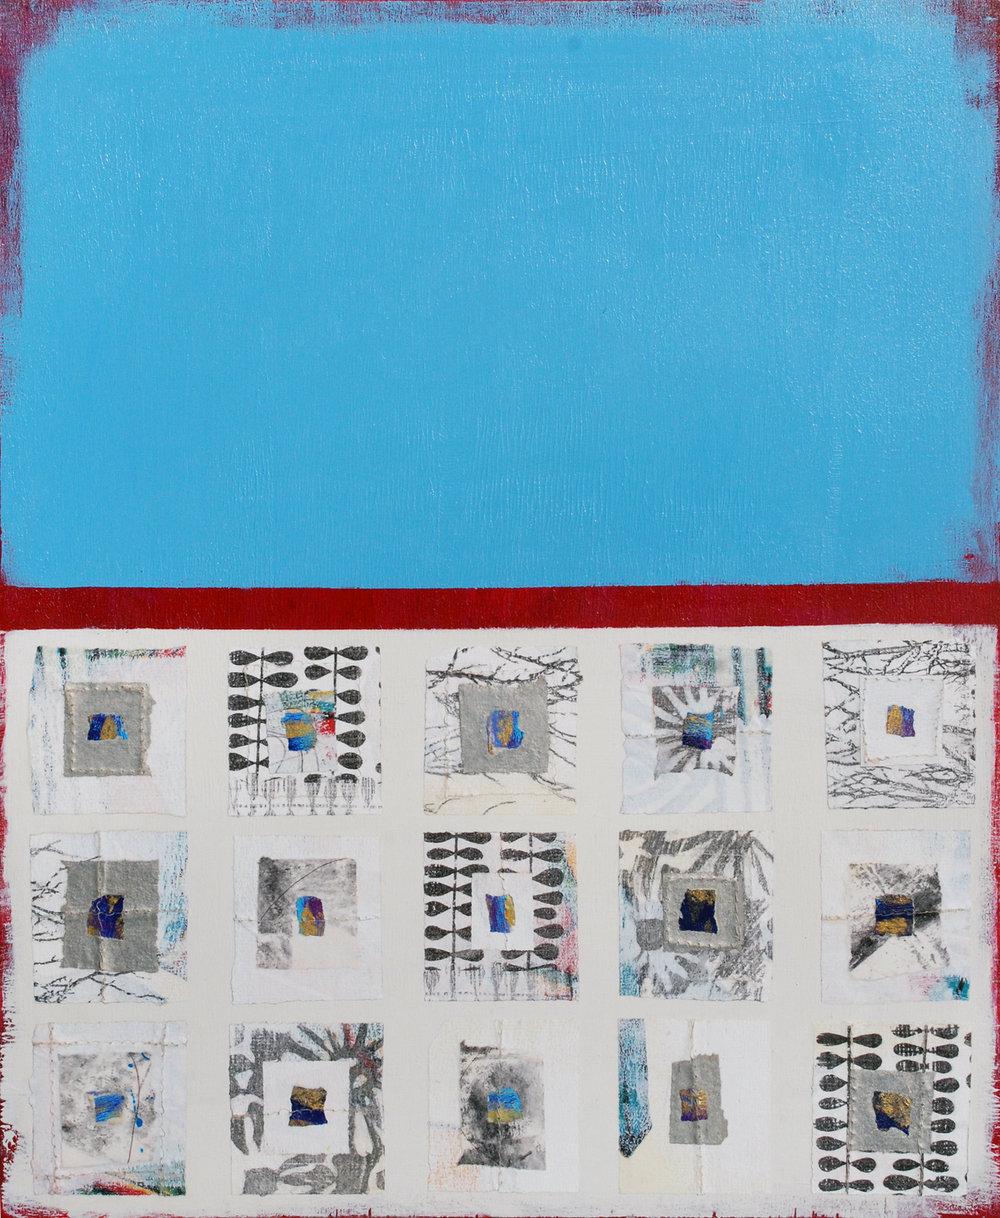 <b>Holly Harrison</b><br>Gentle on My Mind<br>20 x 16 in.